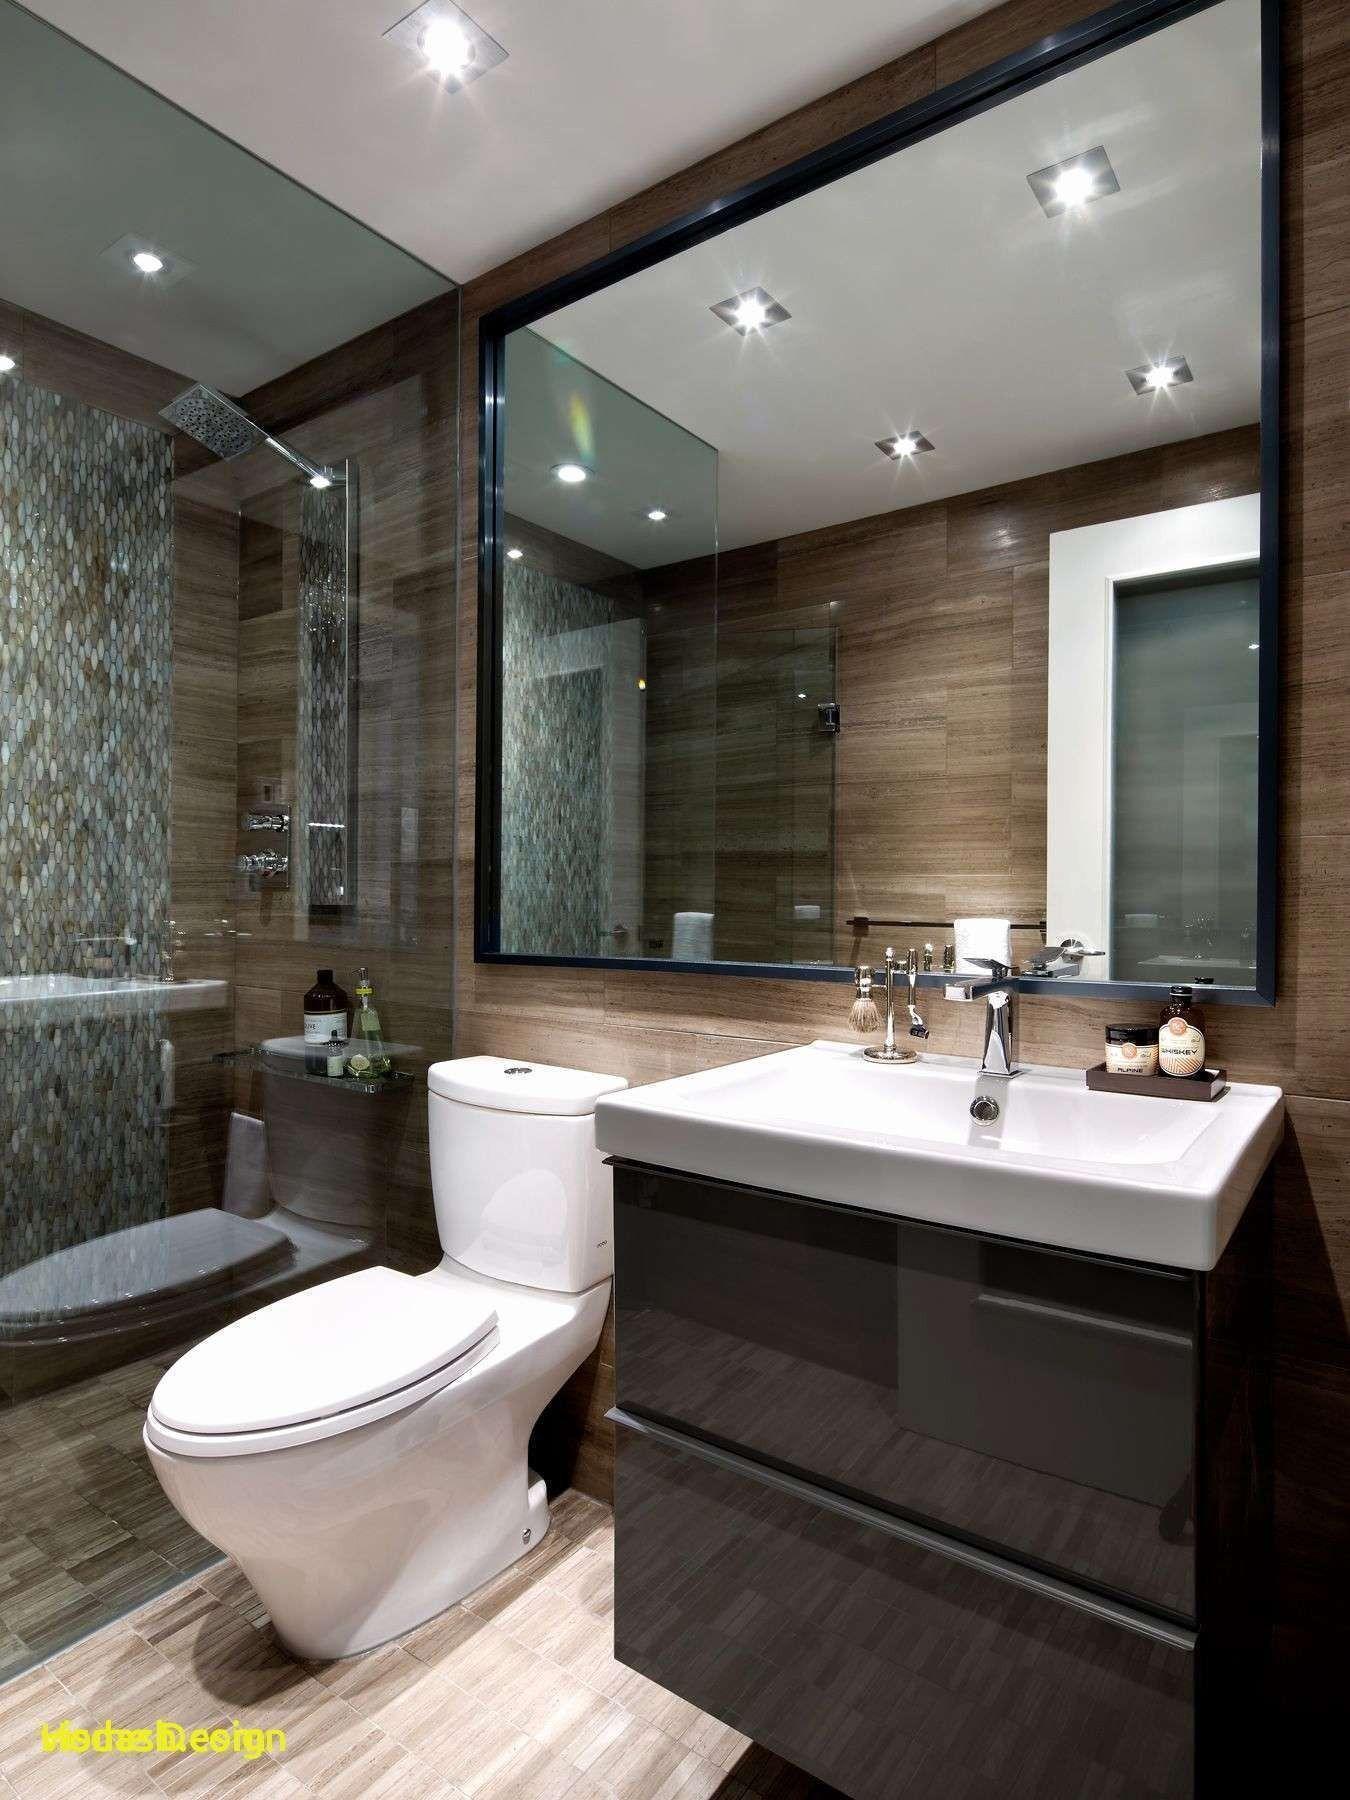 5x10 Bathroom Ideas Well Formed Elegant Bathroom Layout Ideas 9 X 7 Home Design Bathroomdesign9x7 Bathroom Design Small Condo Bathroom Small Bathroom Remodel